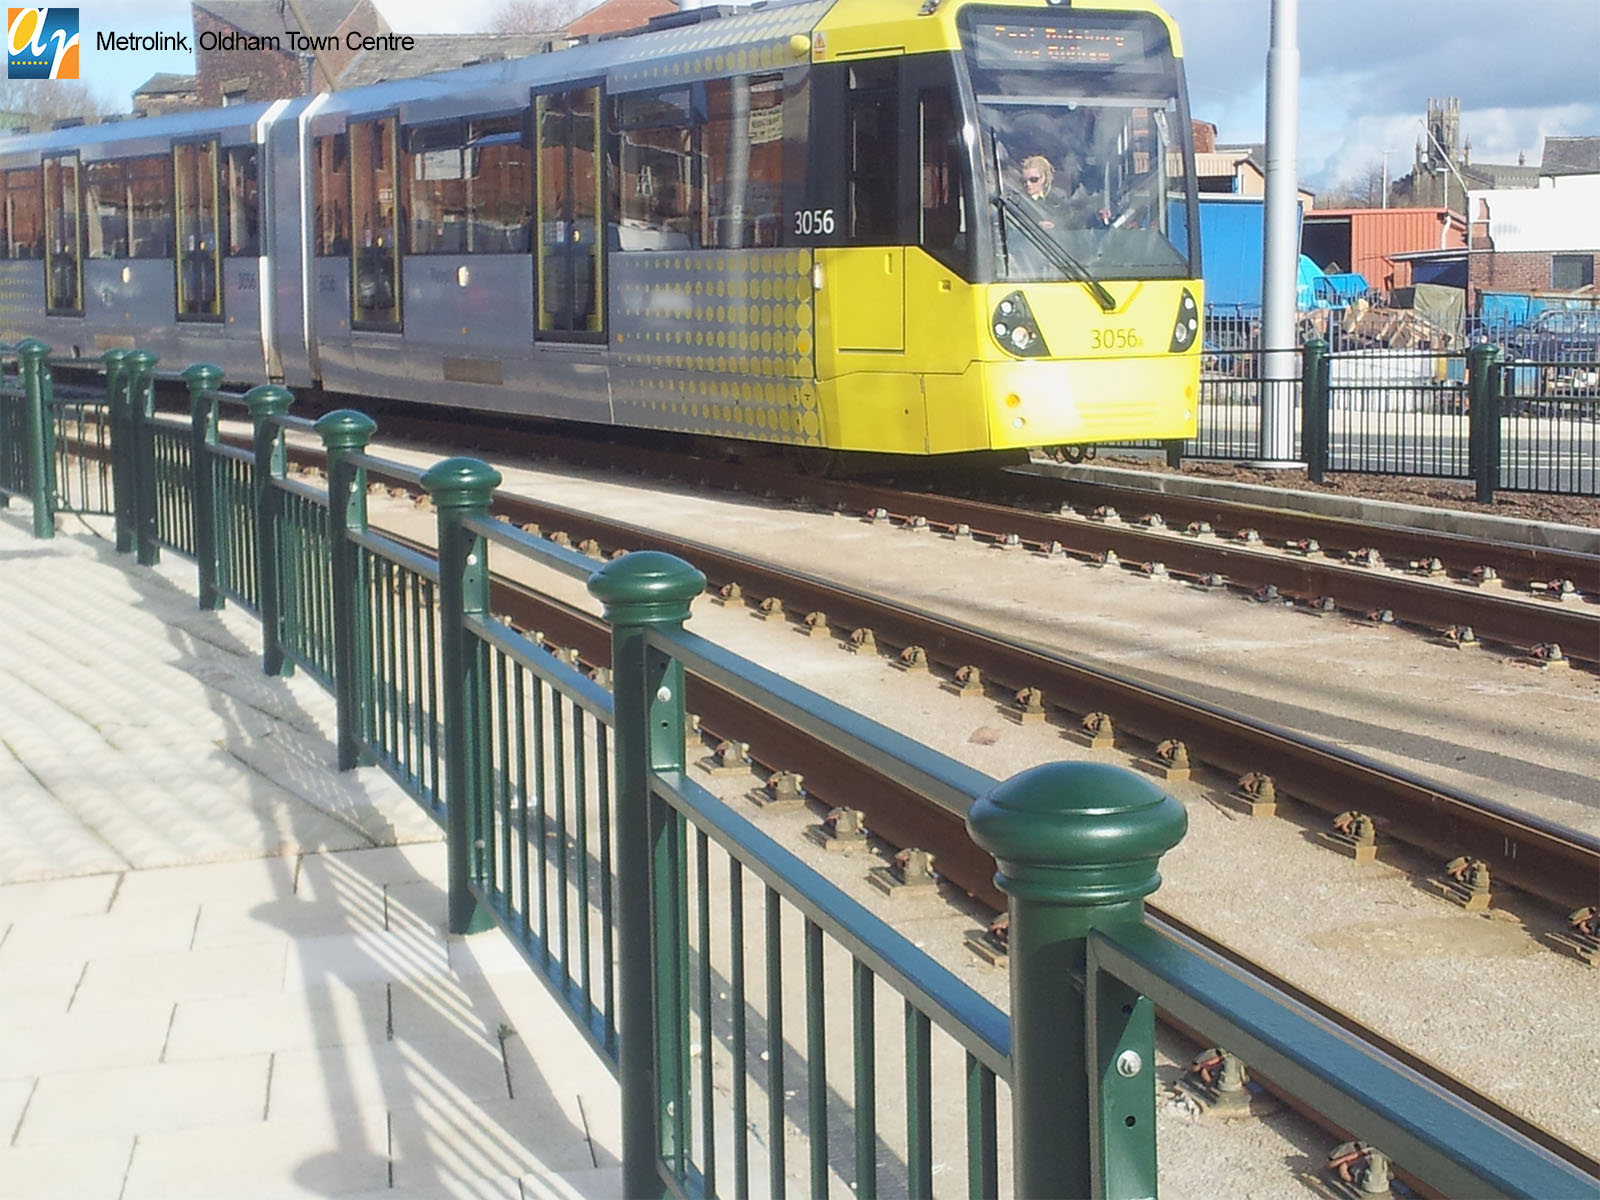 Metrolink, Oldham Decorative Pedestrian Guardrail